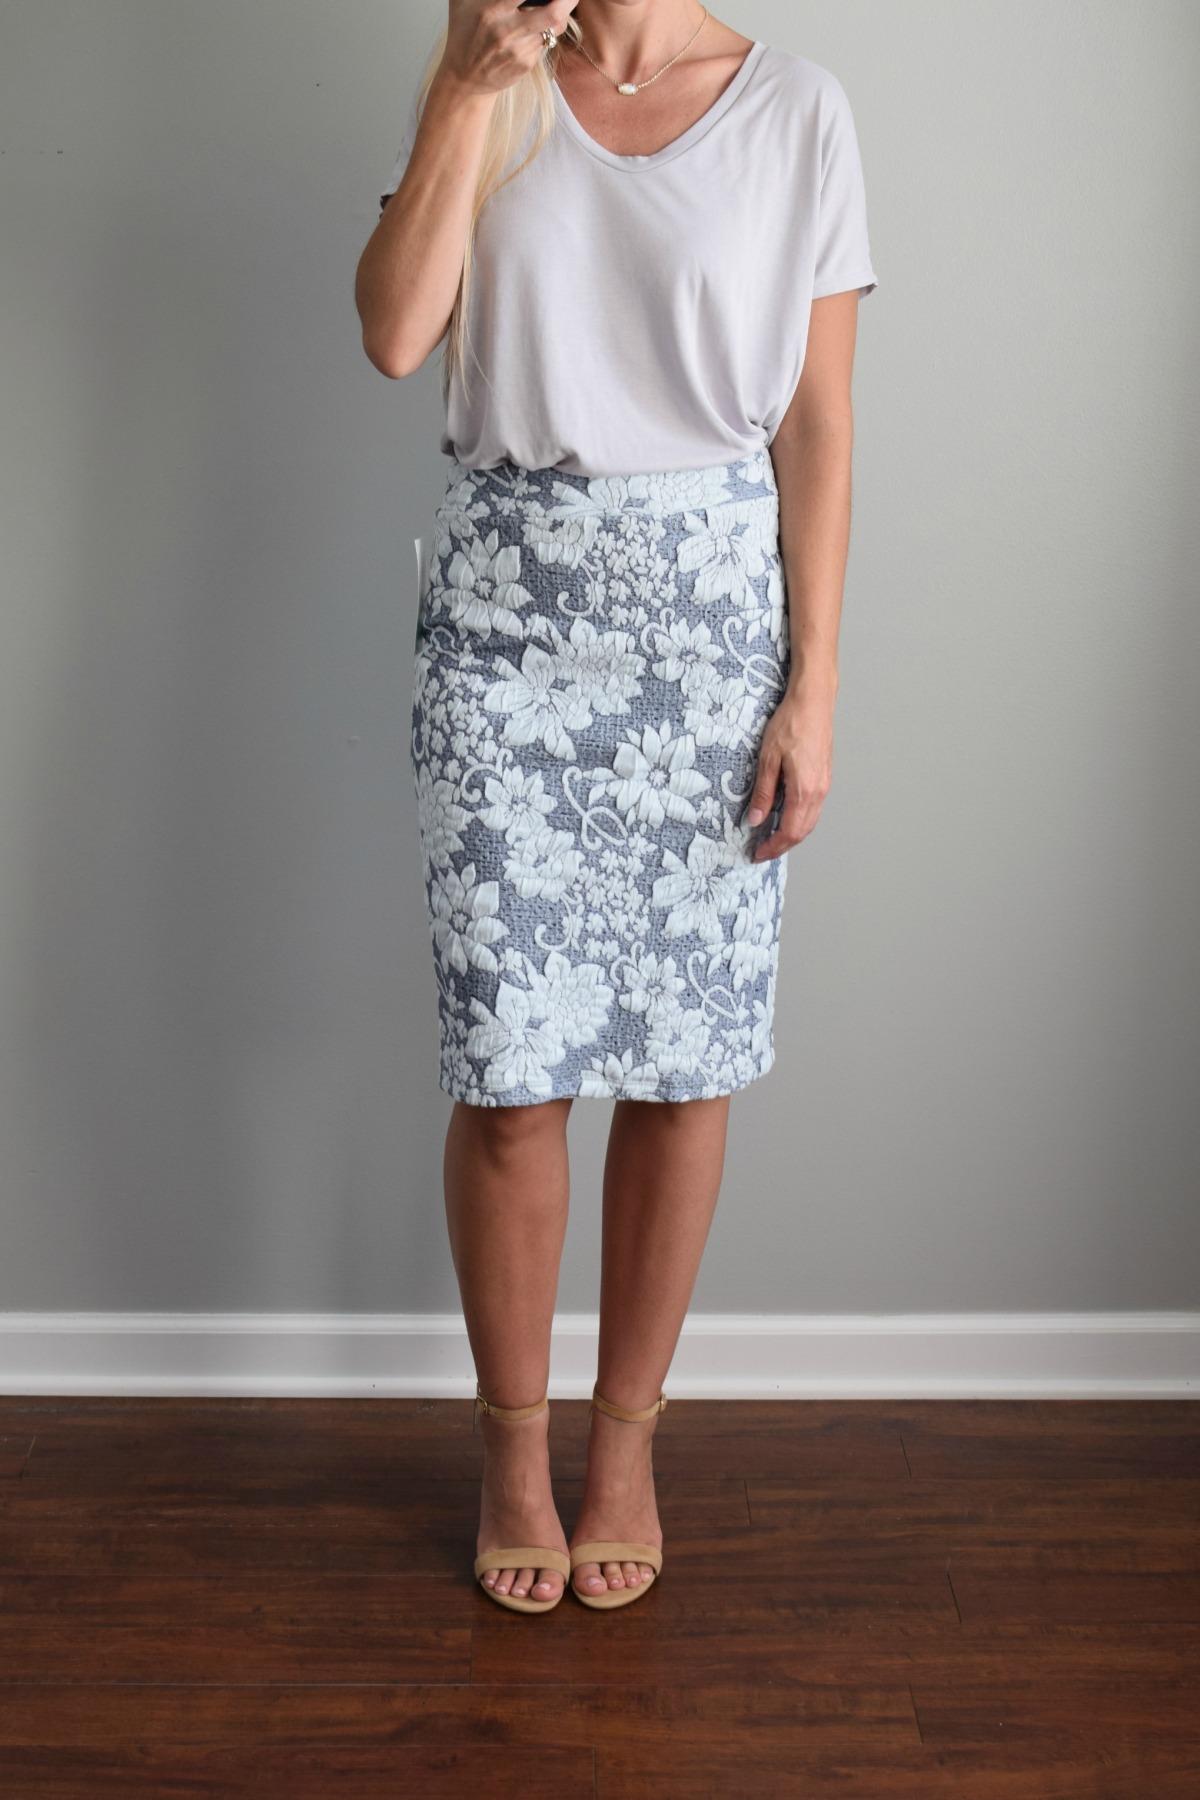 Stitch Fix Review August 2016: Gilli Gretchen Printed Skirt |www.pearlsandsportsbras.com|